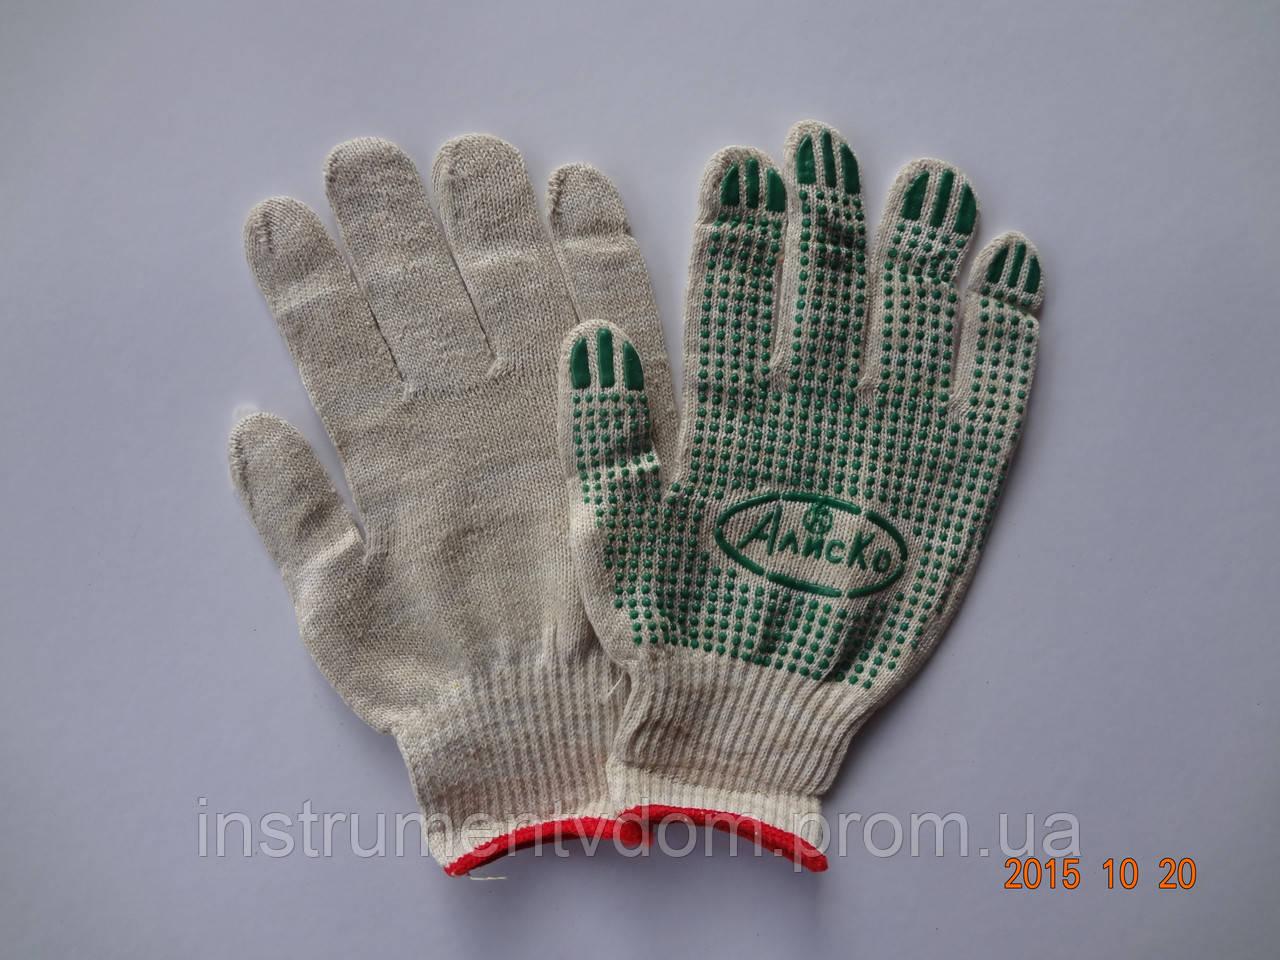 "Перчатки белые х/б с ПВХ точкой  ""АлисКо"" (упаковка 10 пар)"